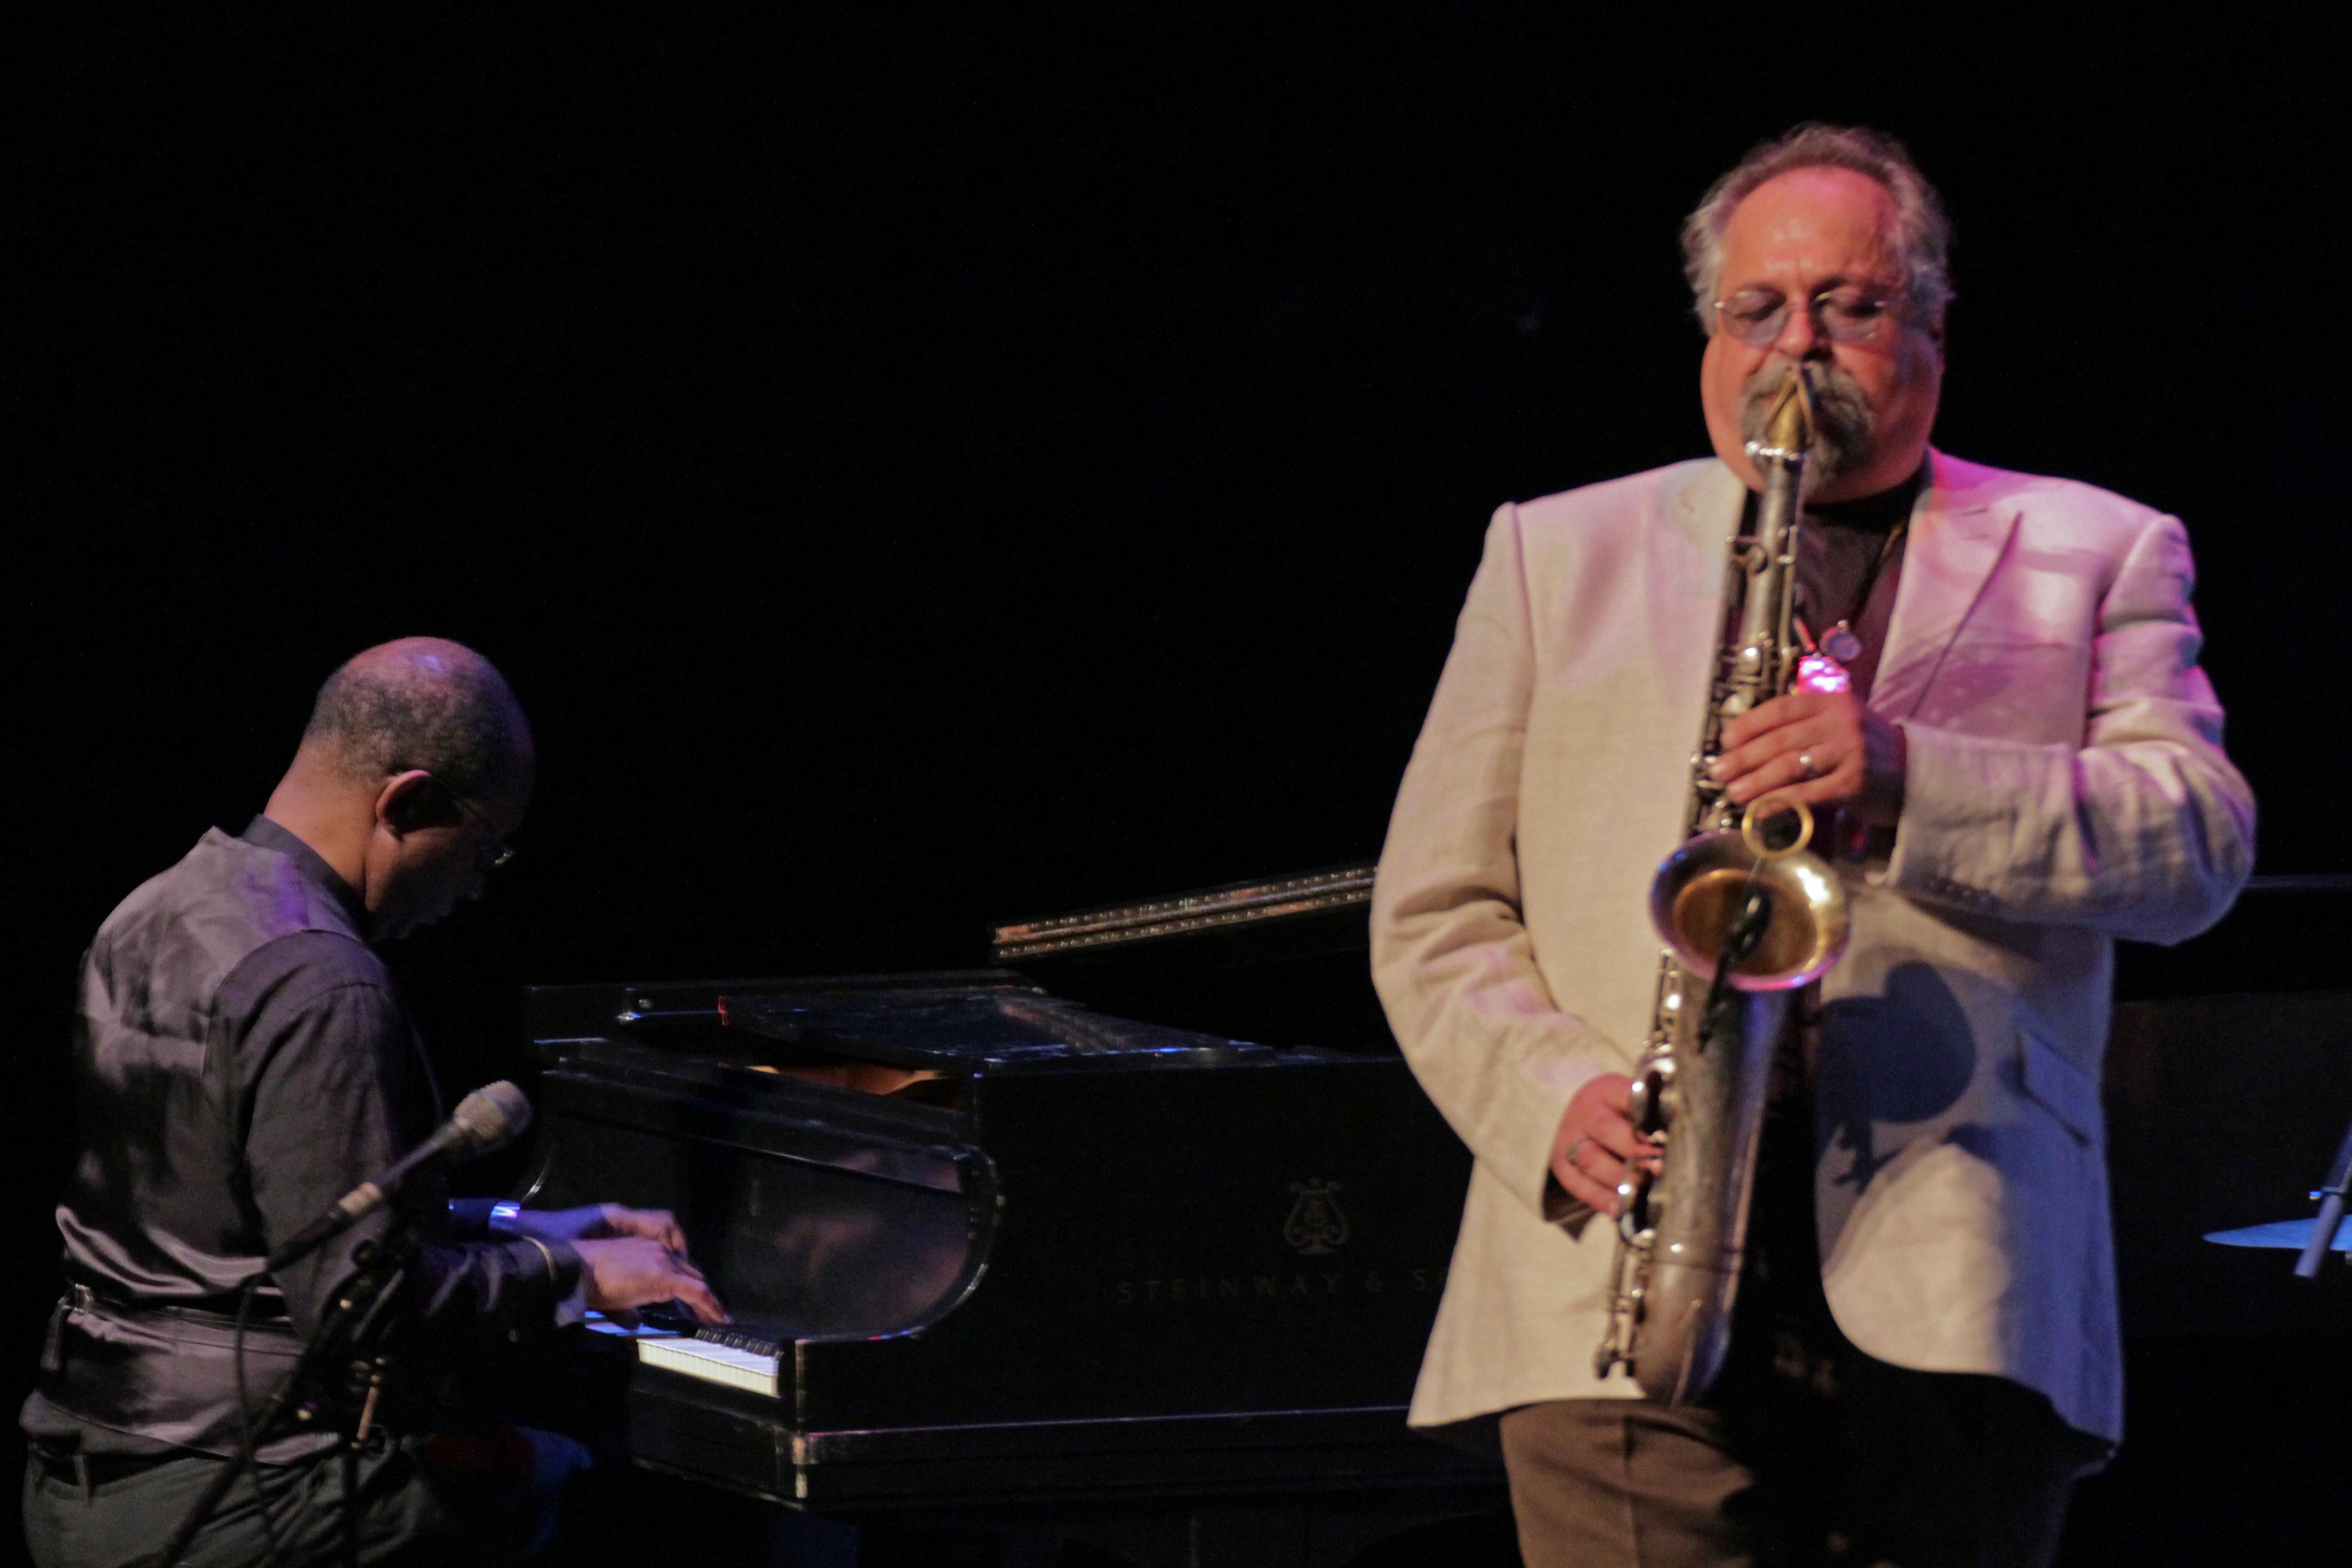 James weidman and joe lovano at tri-c jazzfest cleveland 2013